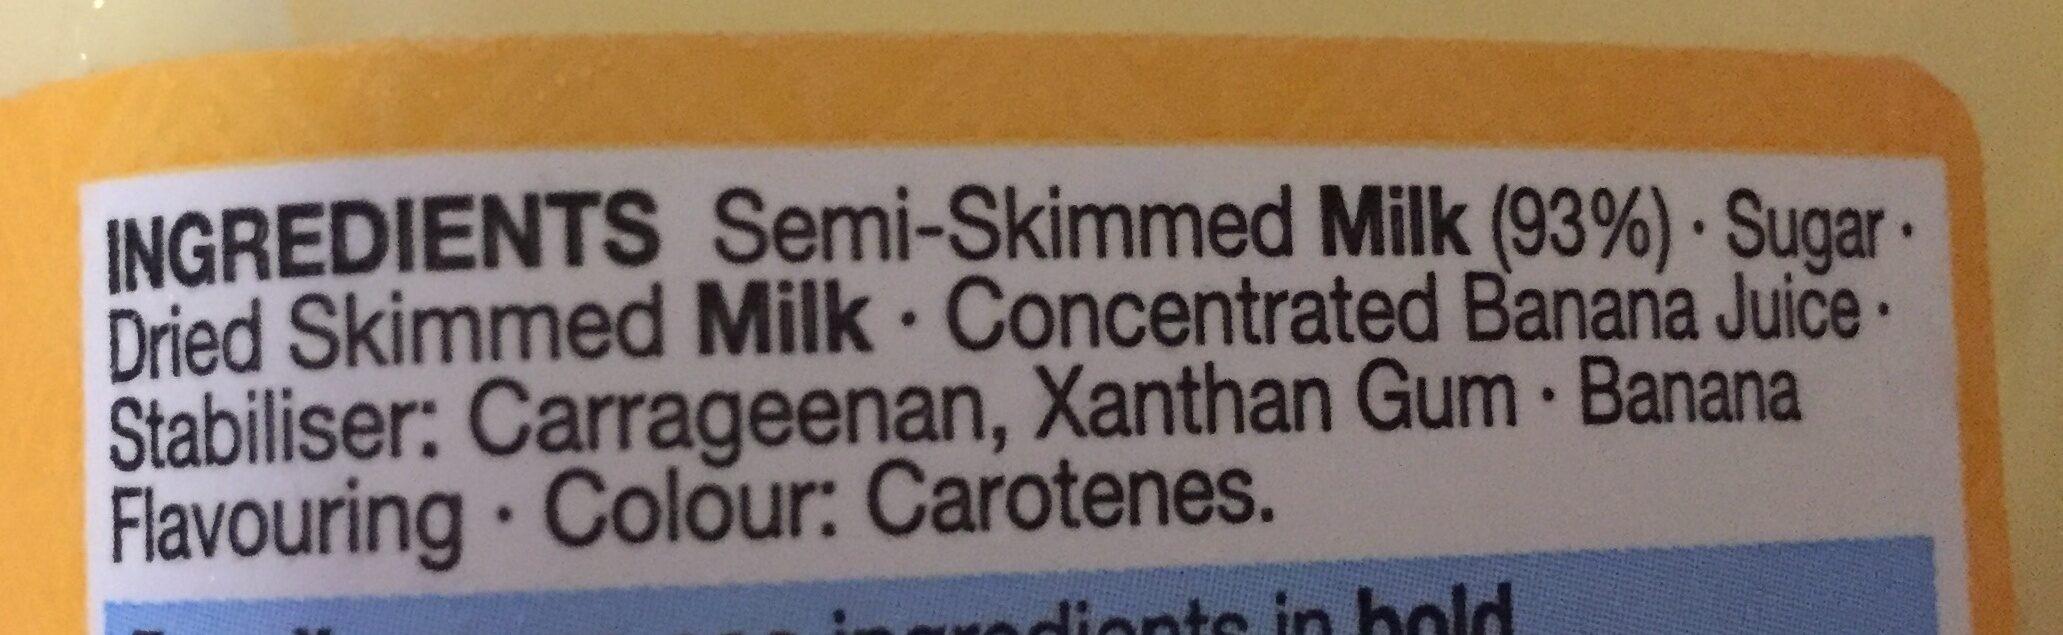 Banana flavoured milk - Ingredients